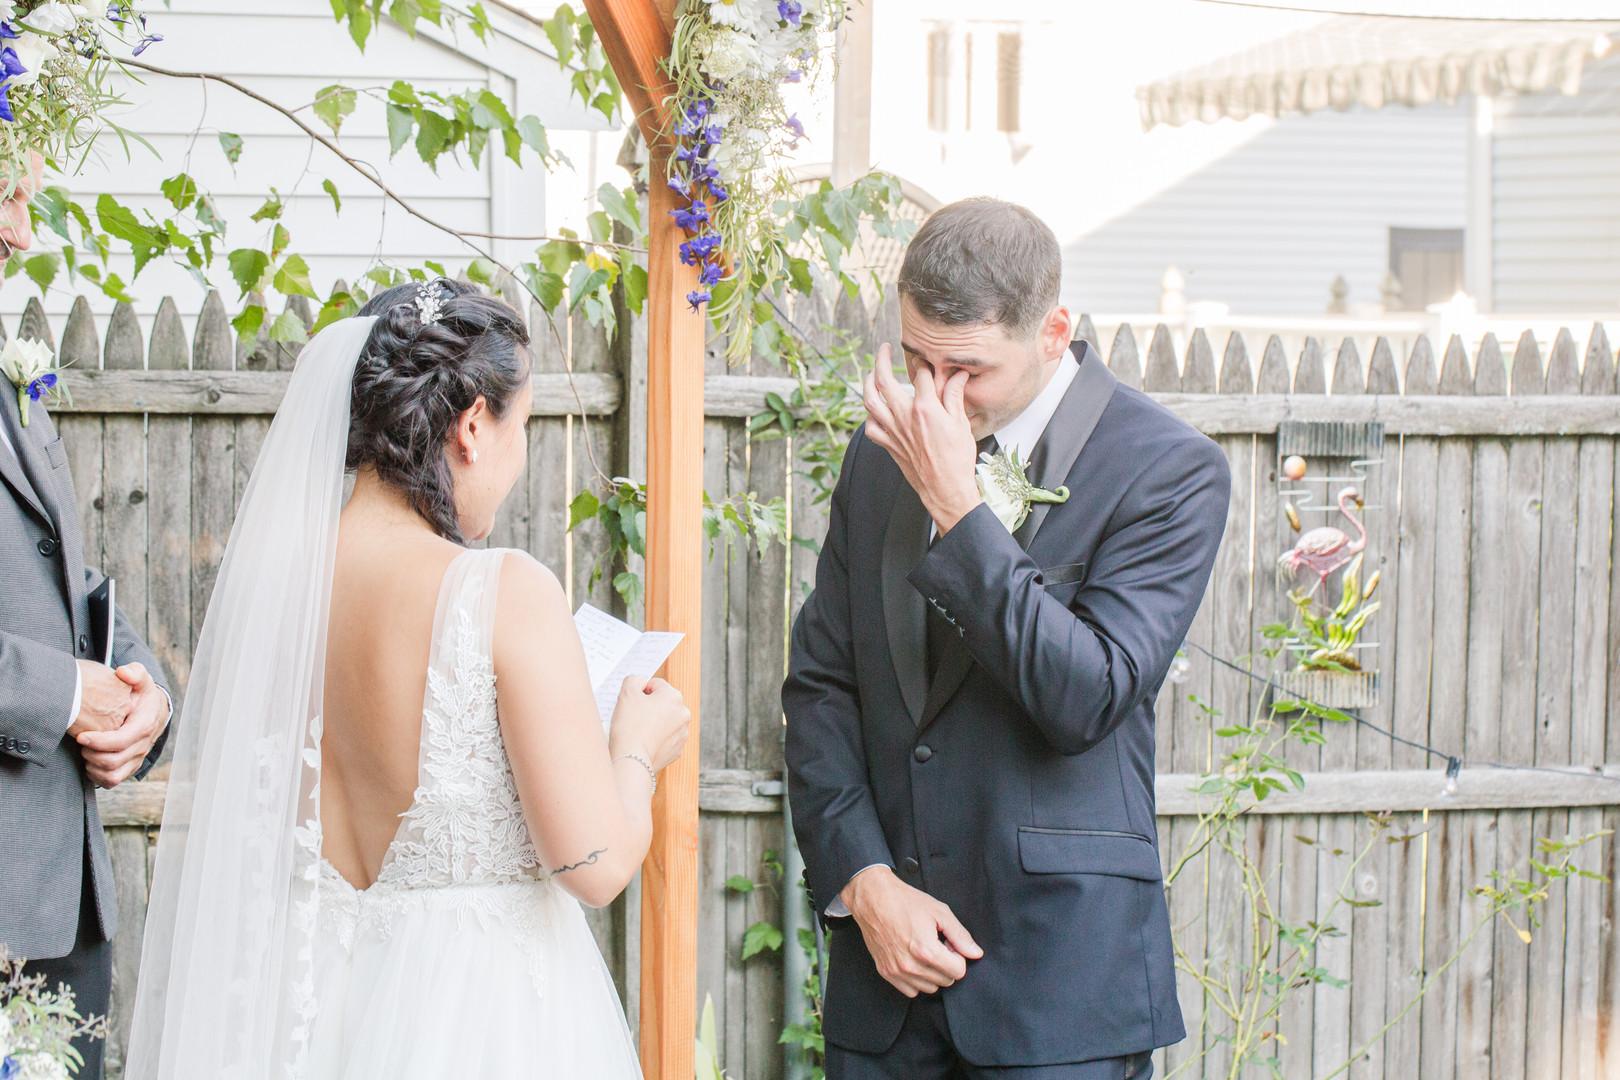 medfordweddingphotography-272.jpg